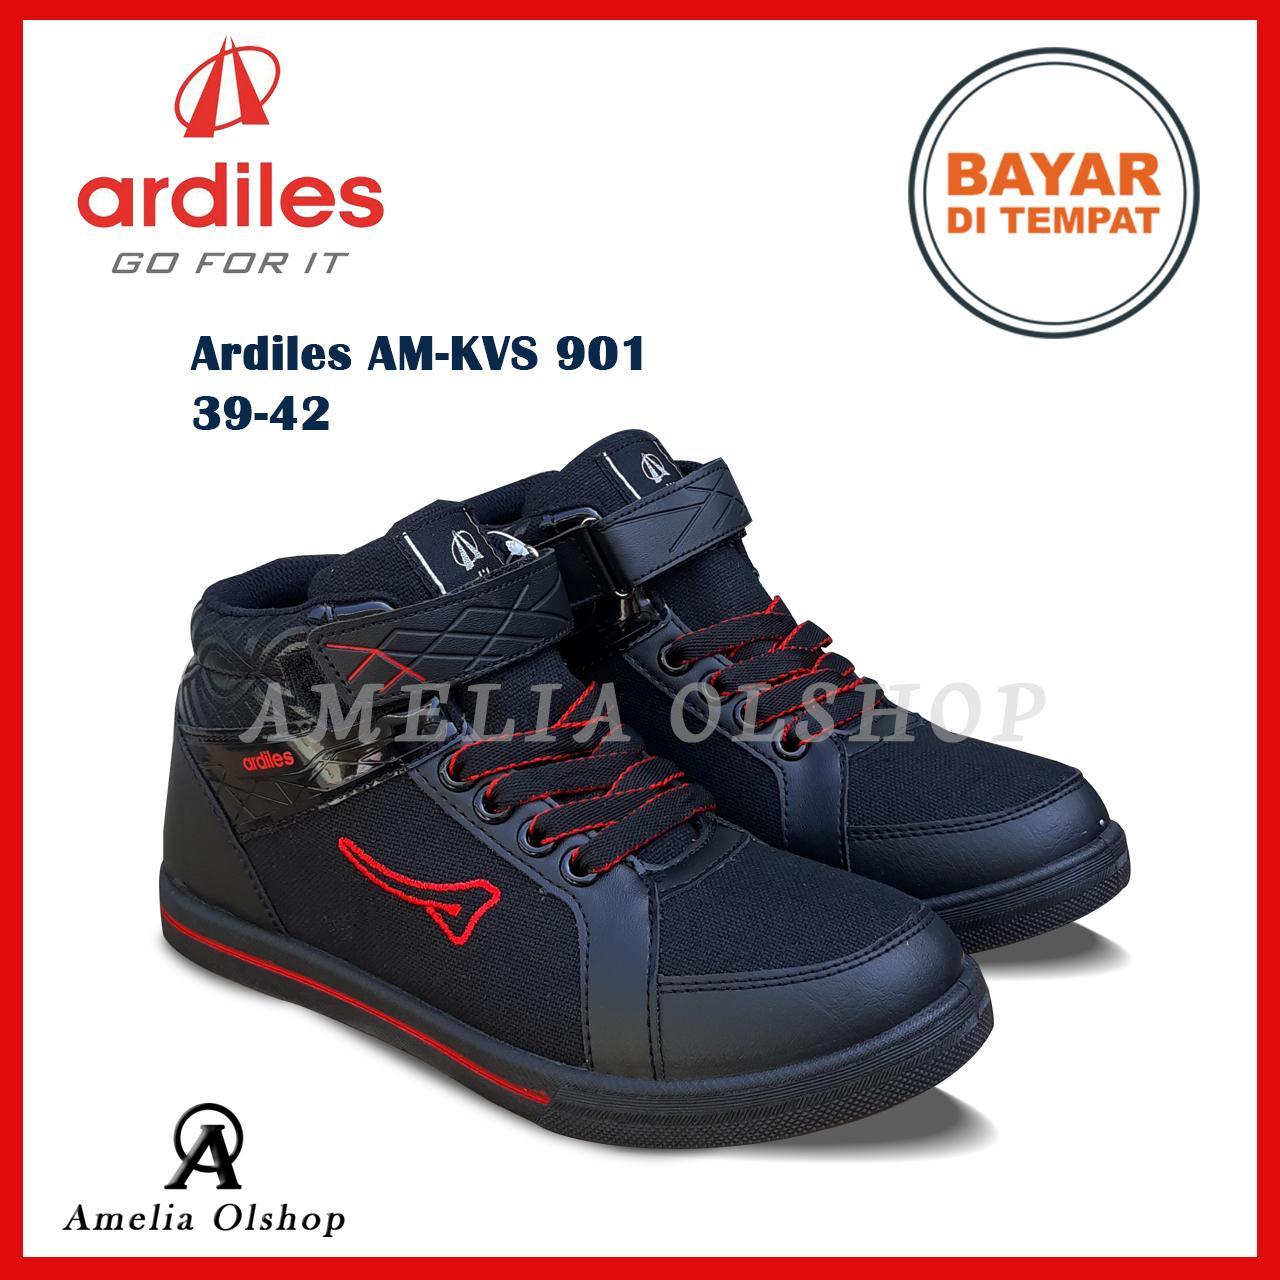 Amelia Olshop - Ardiles Sepatu Sekolah Jaman Now AM-KVS-901 9d48c436ae